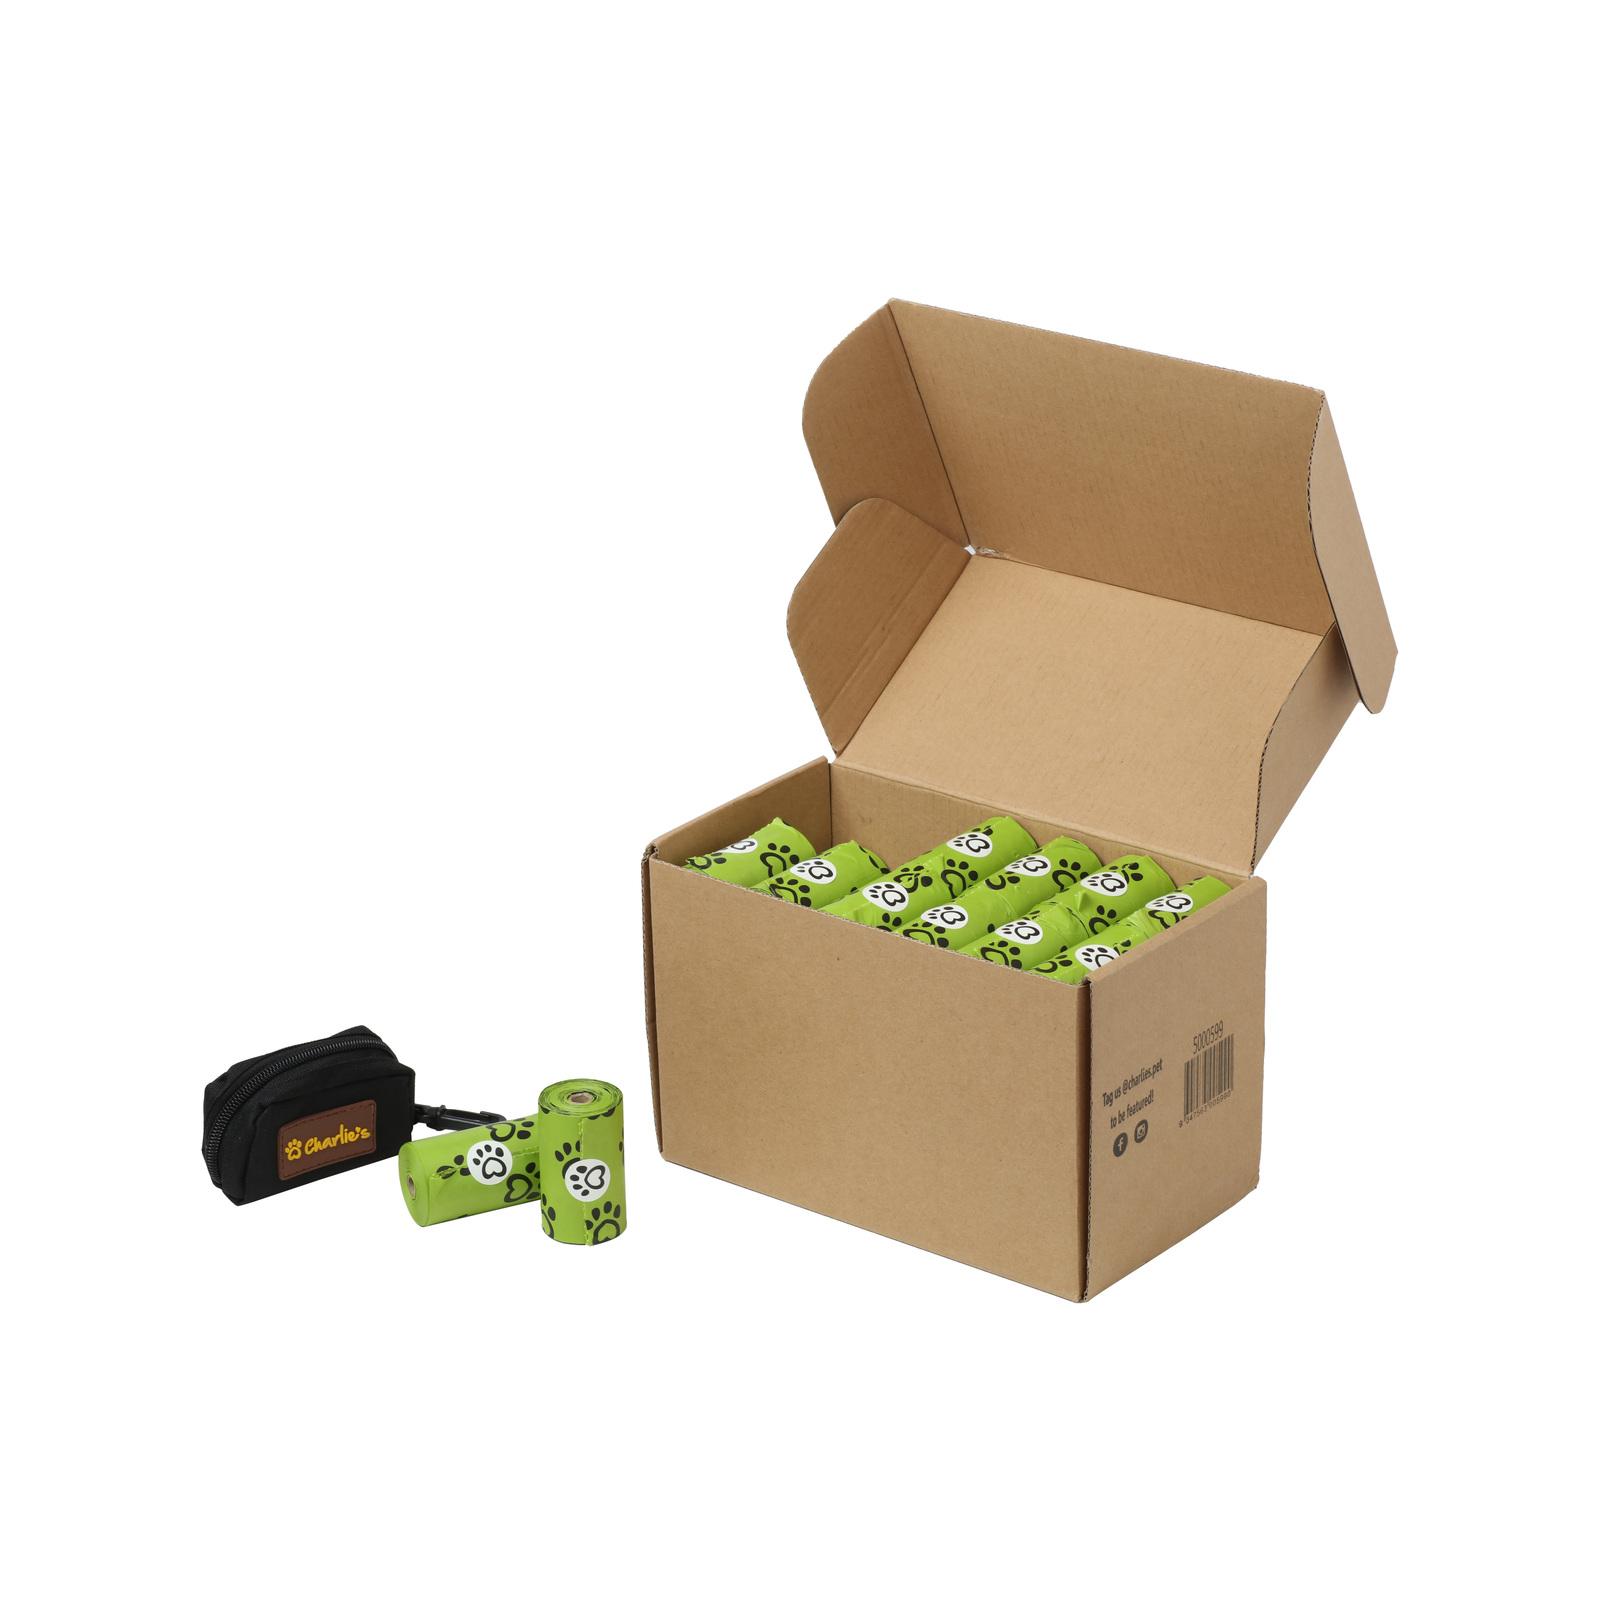 Charlie's Pet Eco-Friendly Biodegradable Doggy Poop Bags & Pouch Dispenser Black -  960 Bags